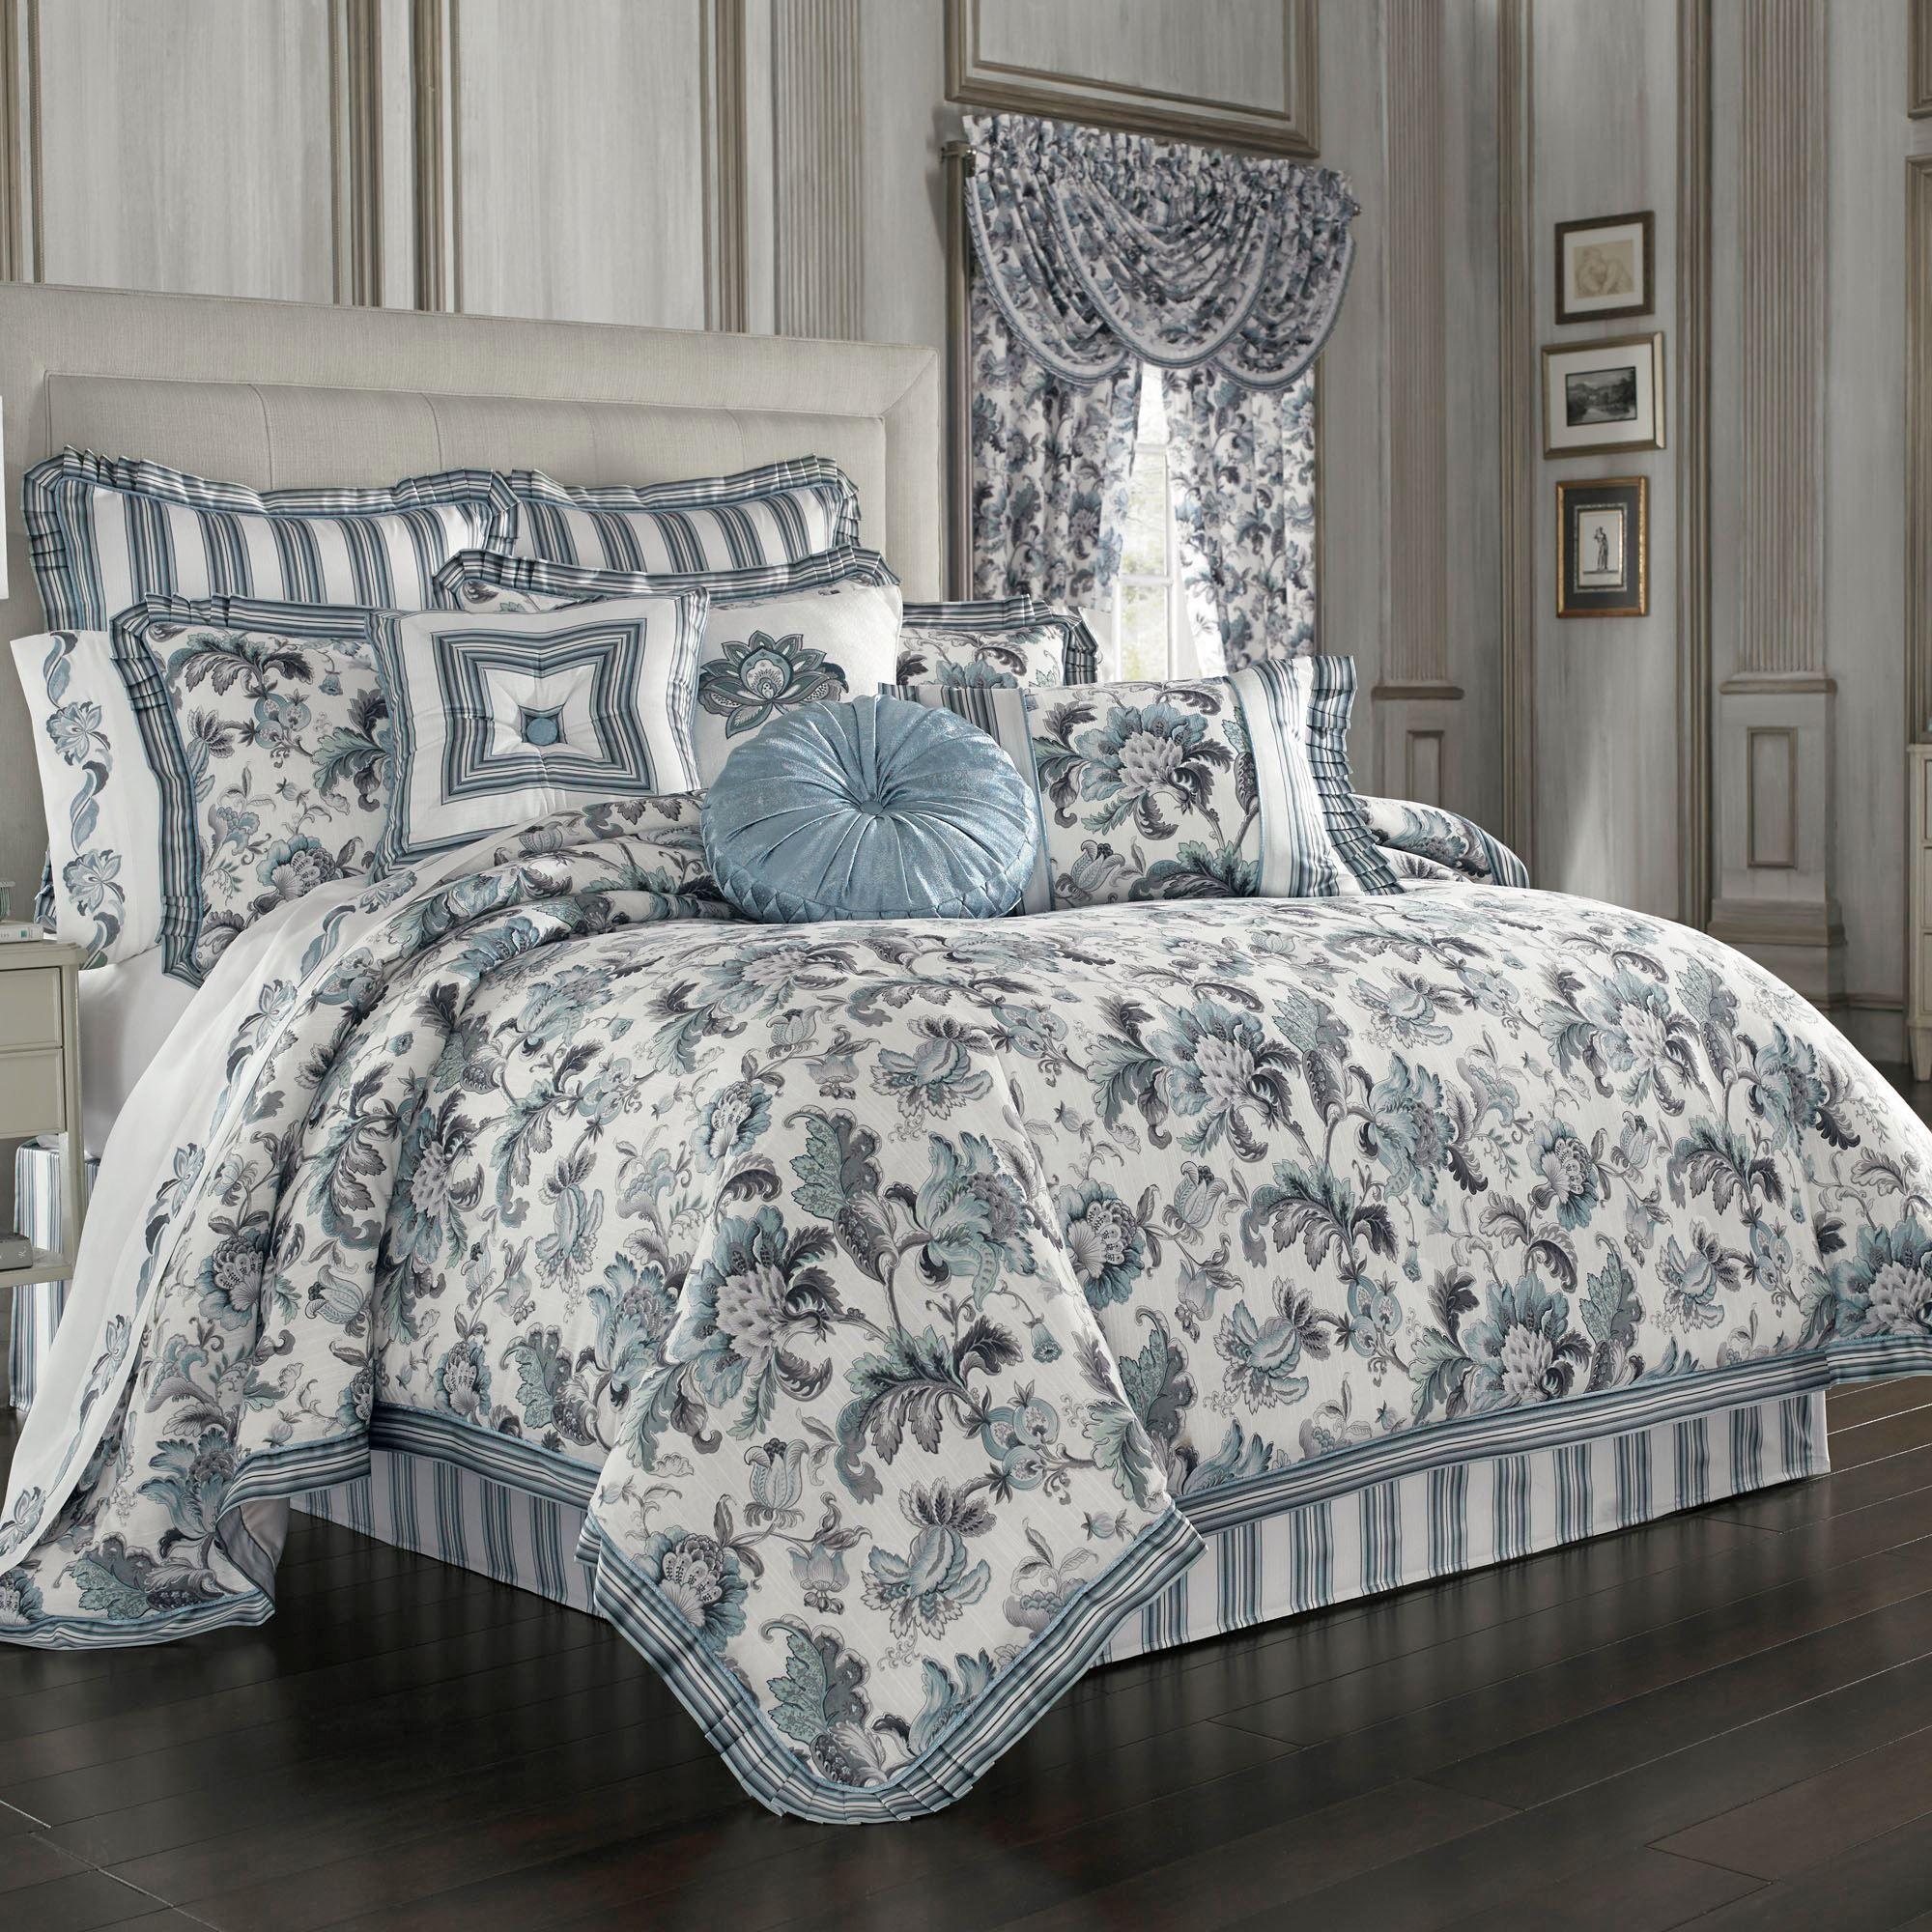 Atrium Jacobean Floral Comforter Bedding by J Queen New